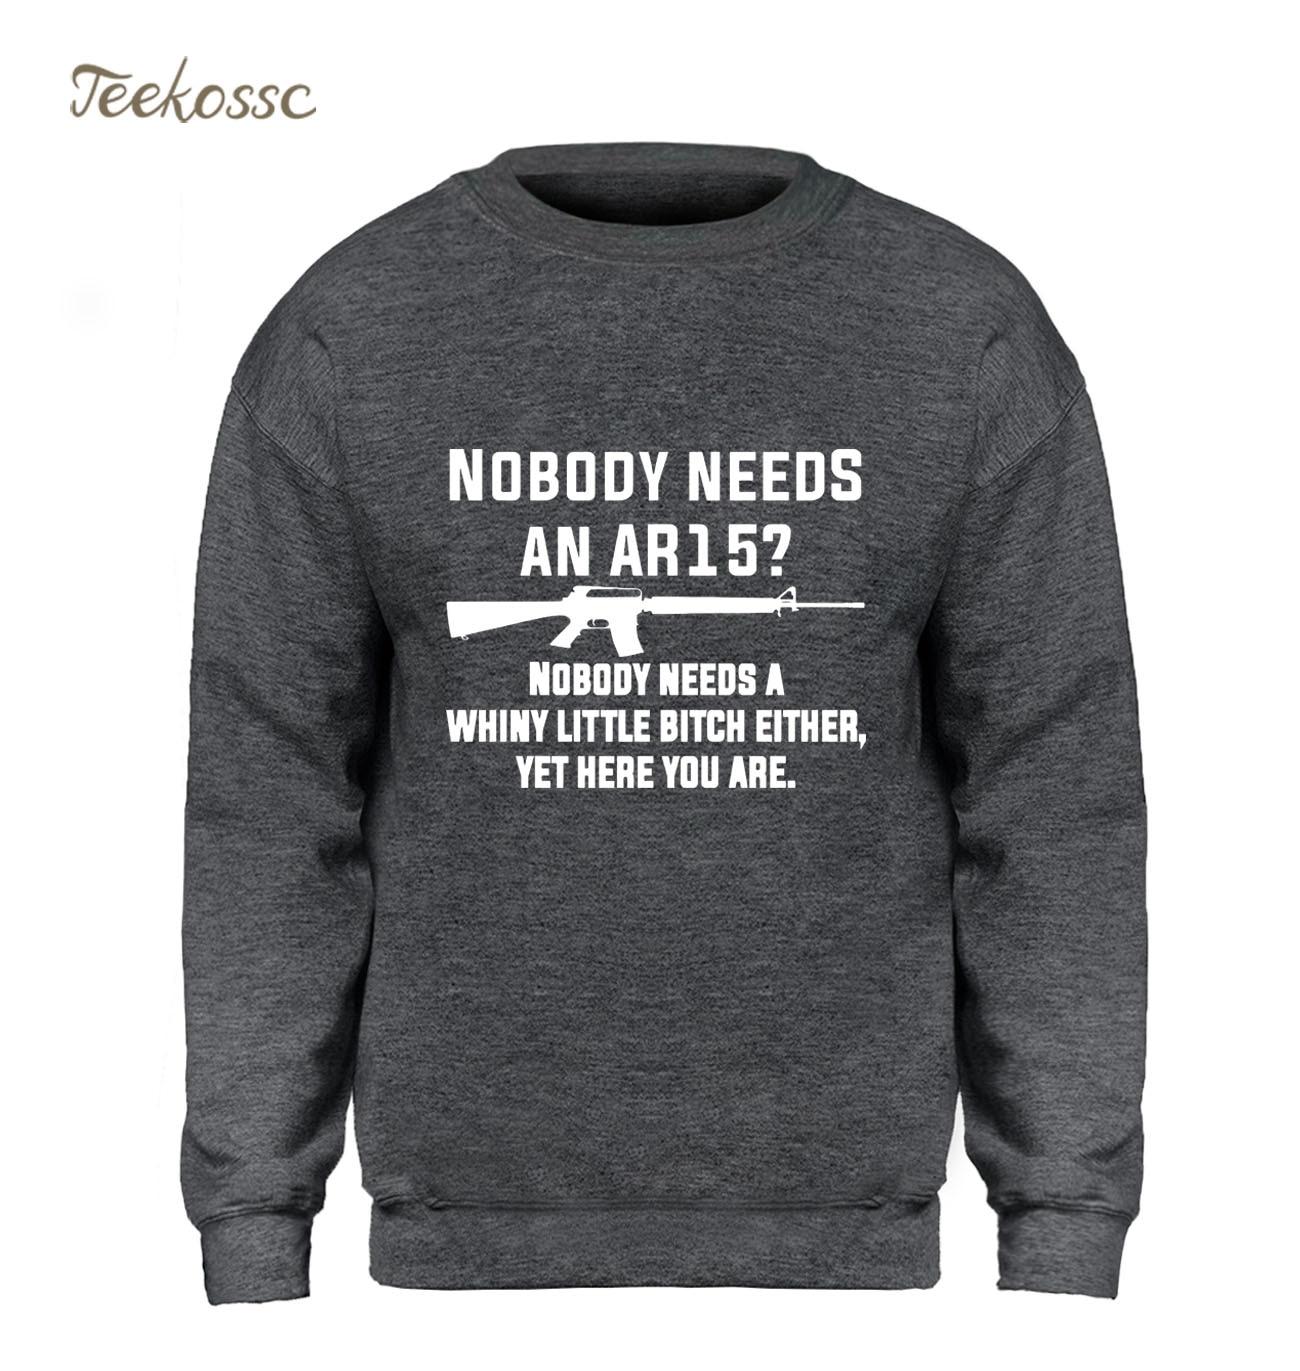 AR15 - Give Peace a Chance Decal Hoodie Men Graphic Sweatshirt Cool Sweatshirts Winter Autumn Fleece Warm Slim Fit Sportswear